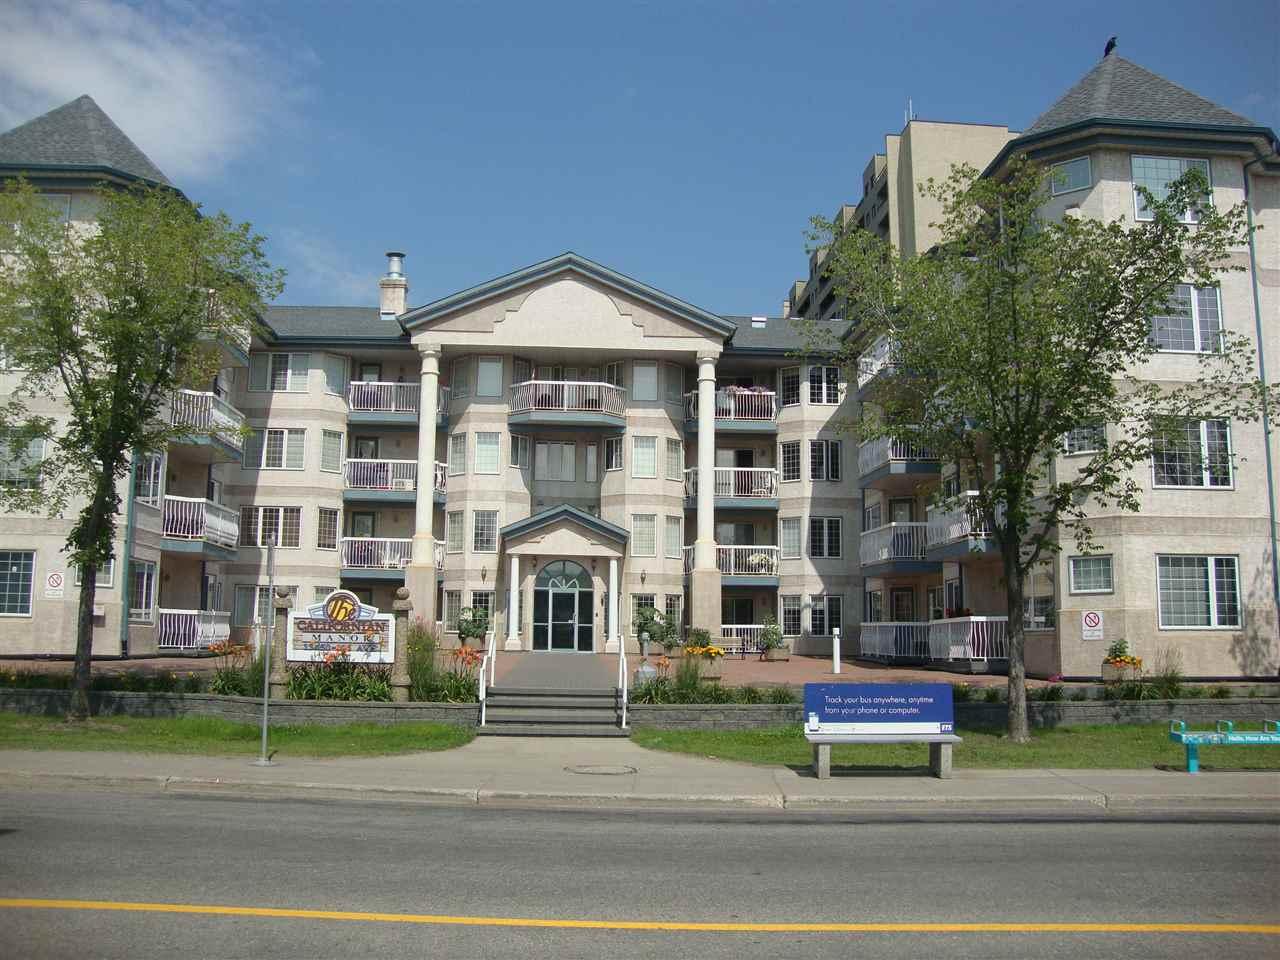 308 13450 114 Avenue, 2 bed, 1 bath, at $199,900